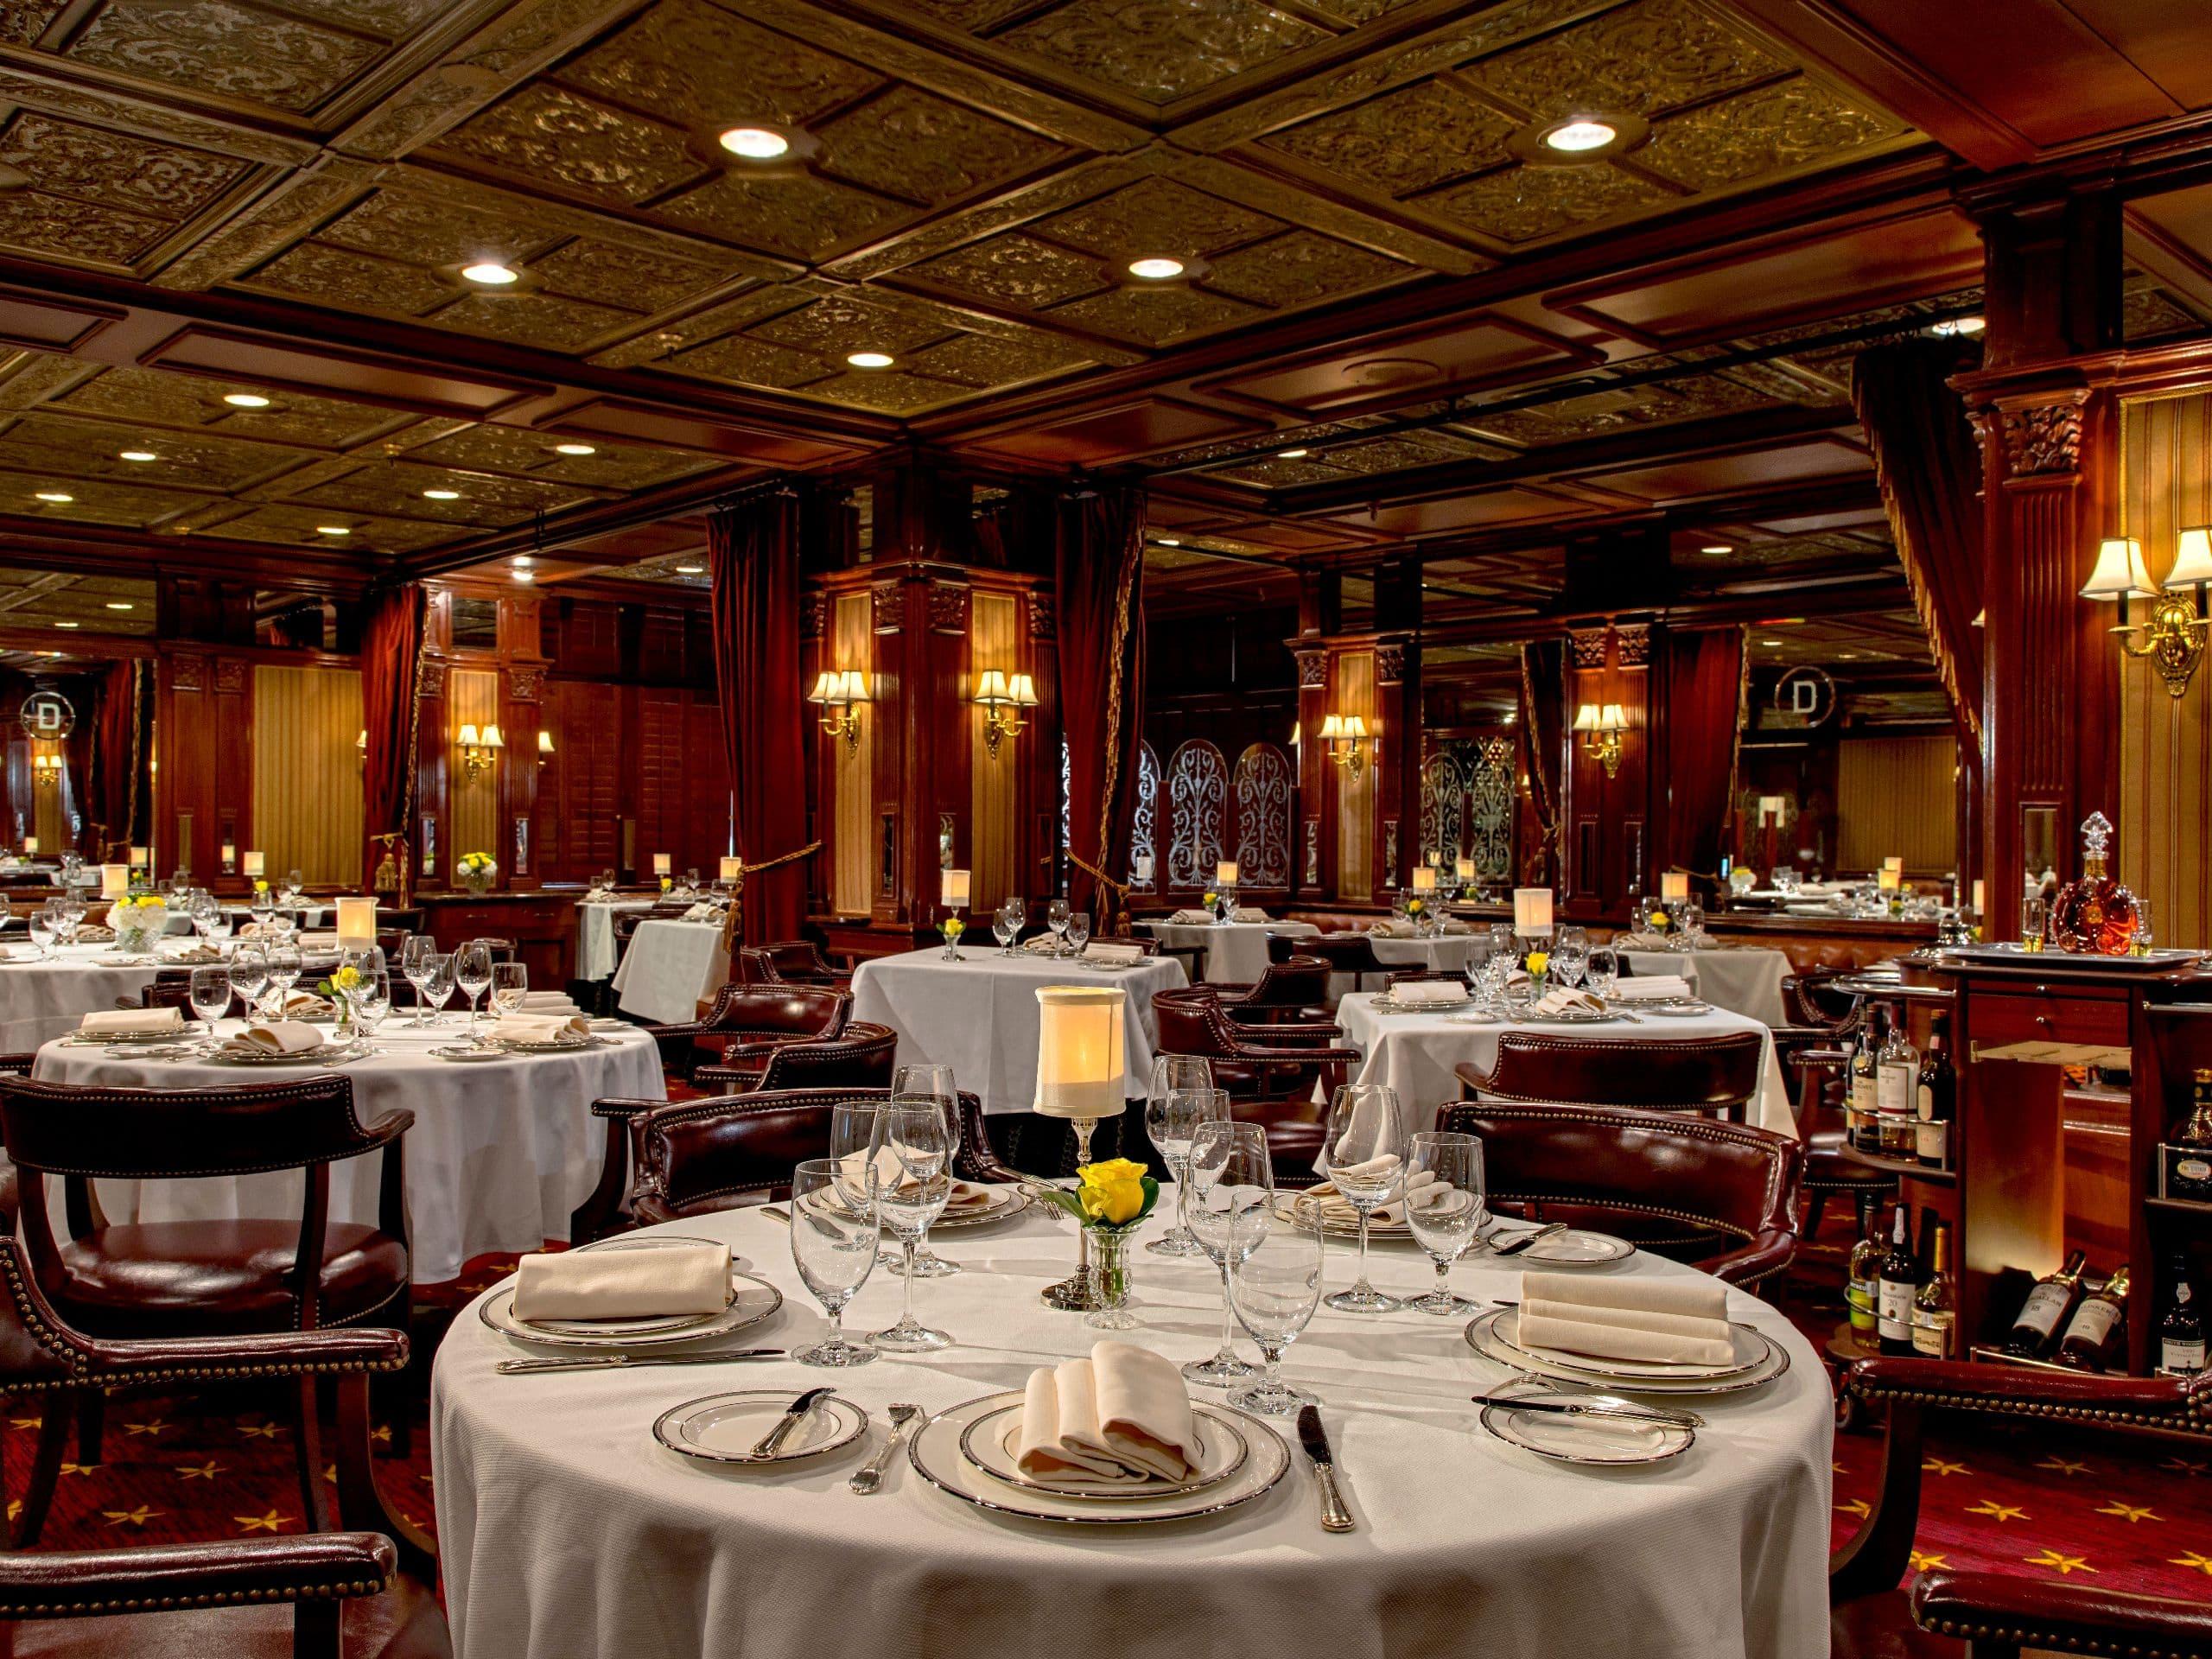 Austins Iconic Hotel On 6Th Street - The Driskill, Unbound